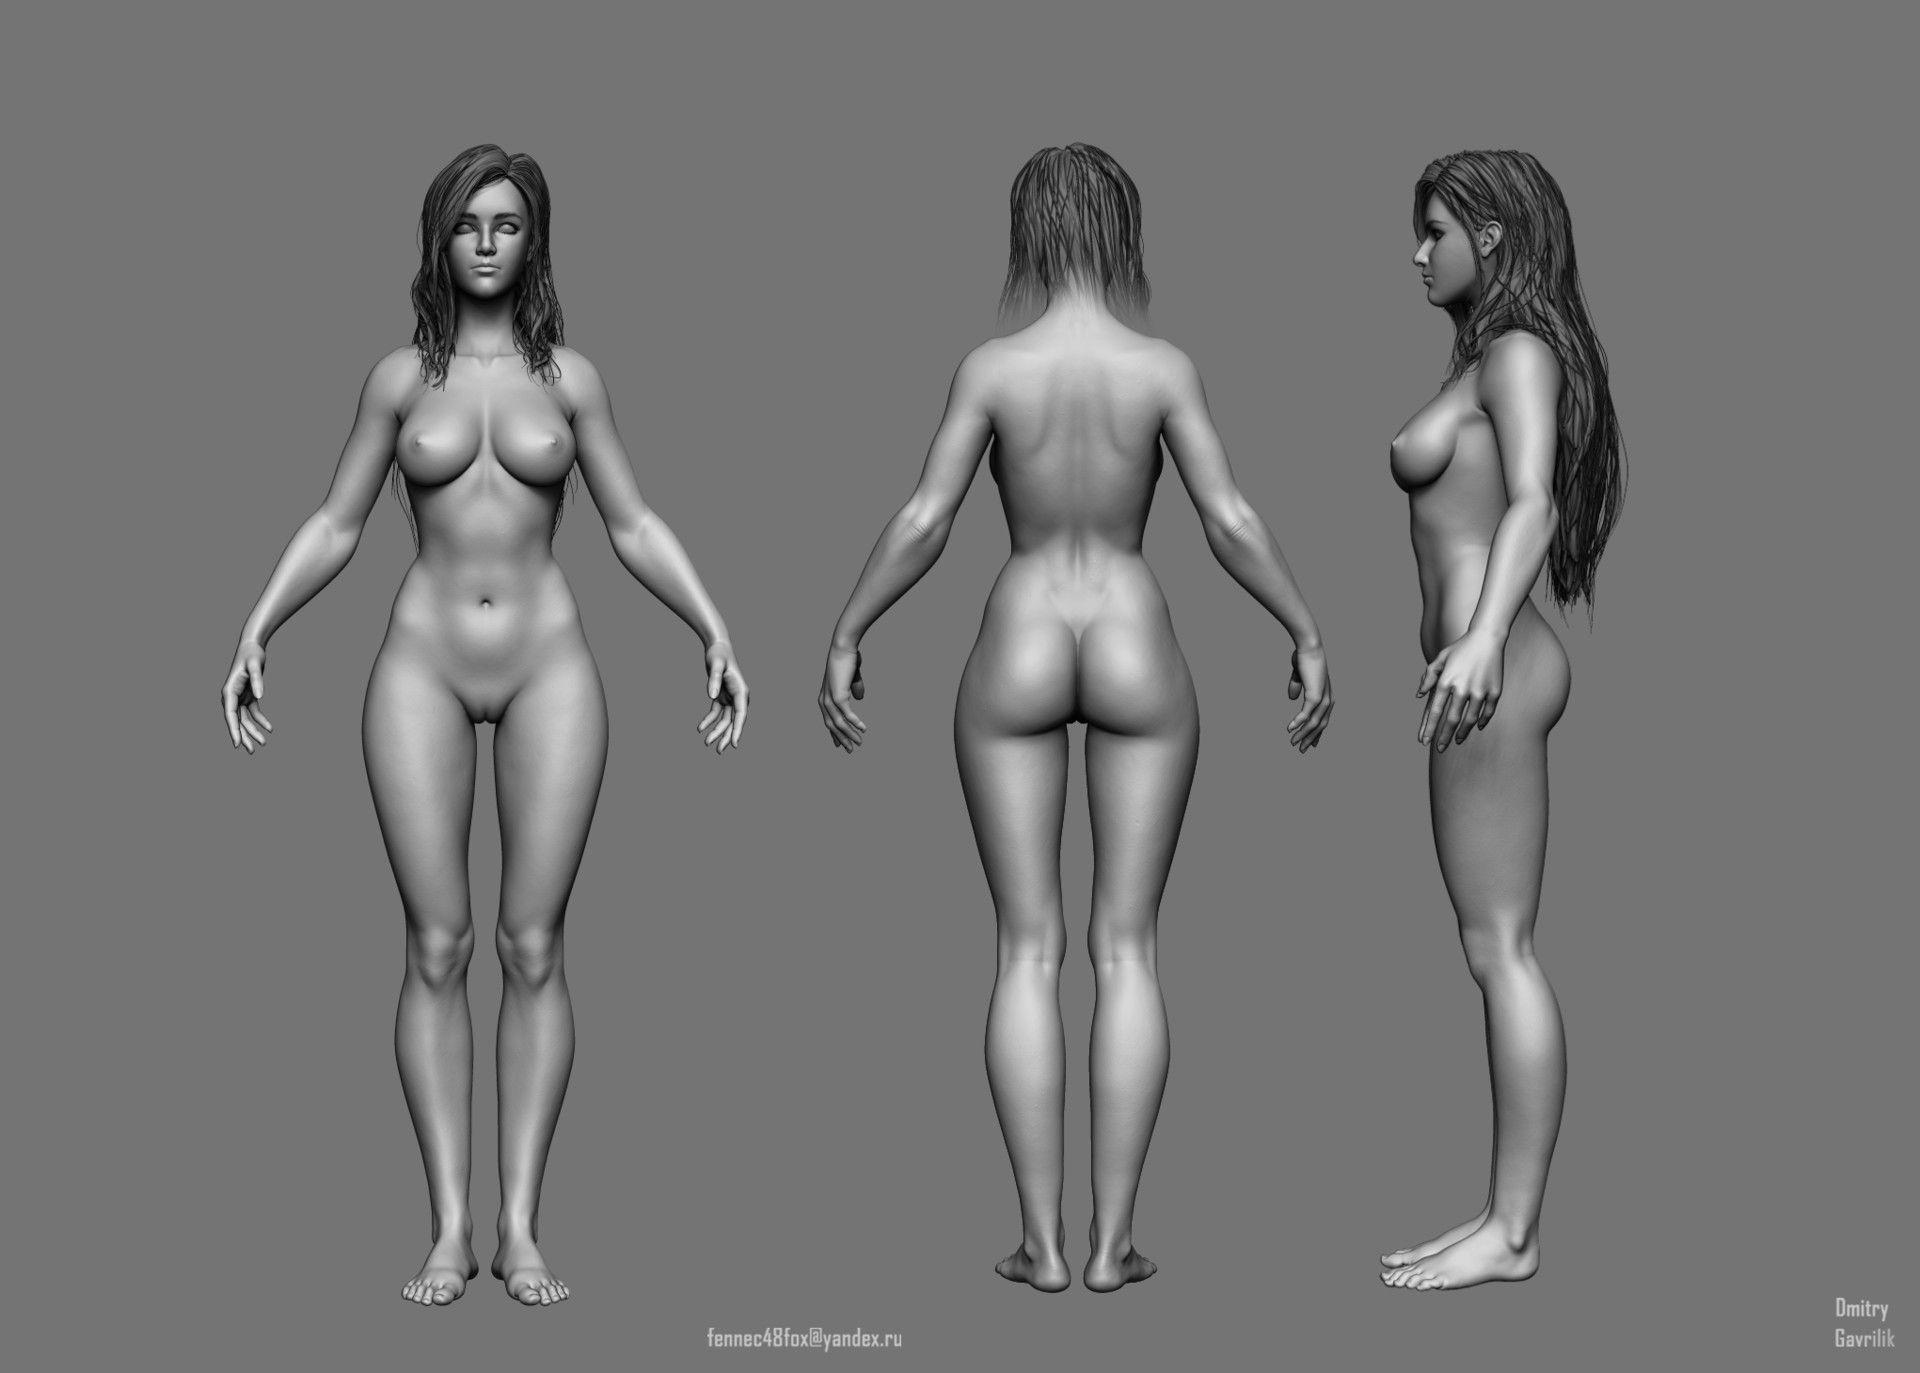 ArtStation - Female Anatomy Study, Dmitry Gavrilik | Woman Body ...